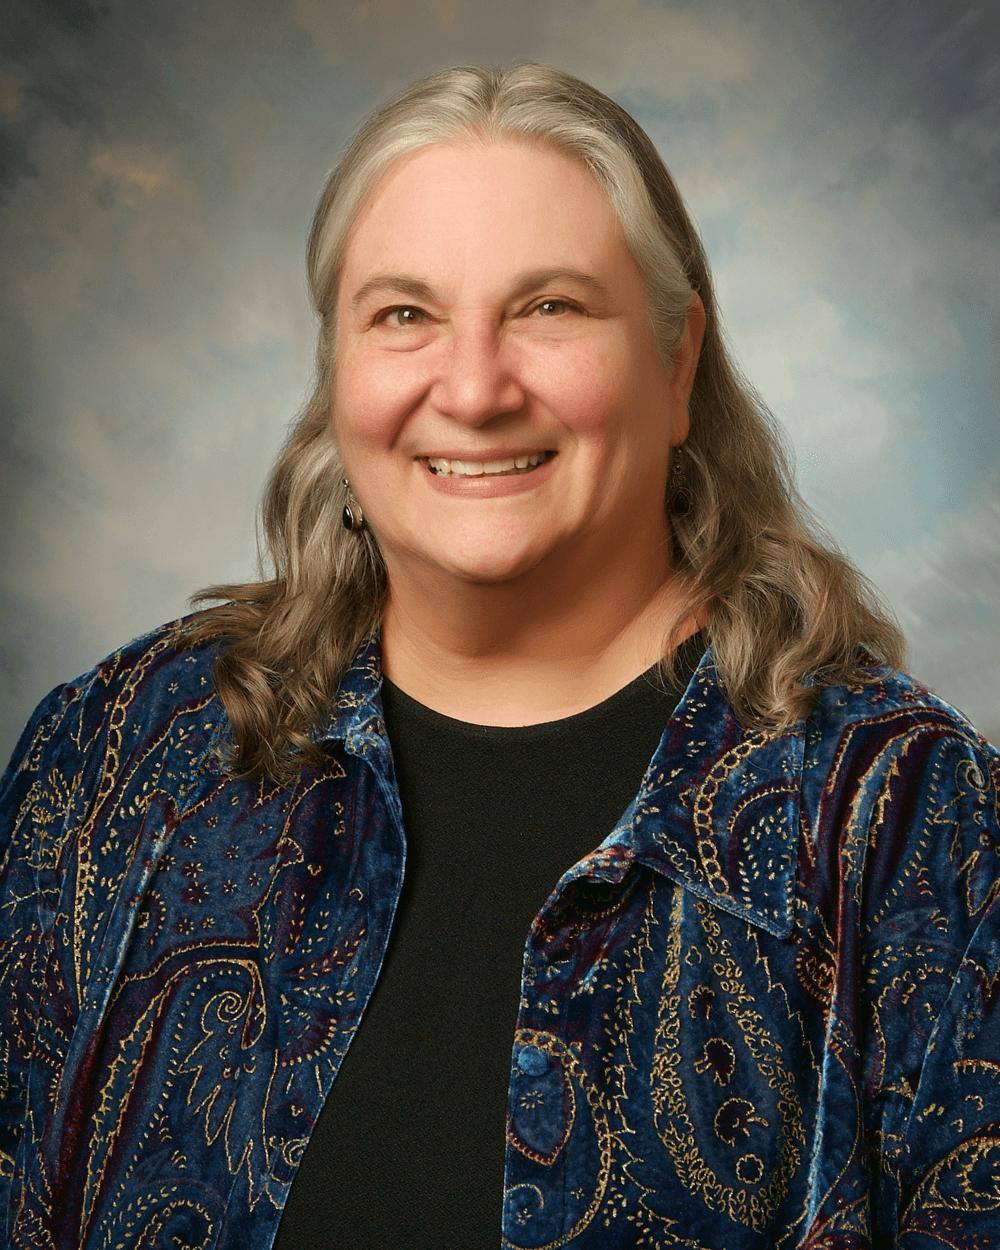 Portrait of Elizabeth W. Weeks